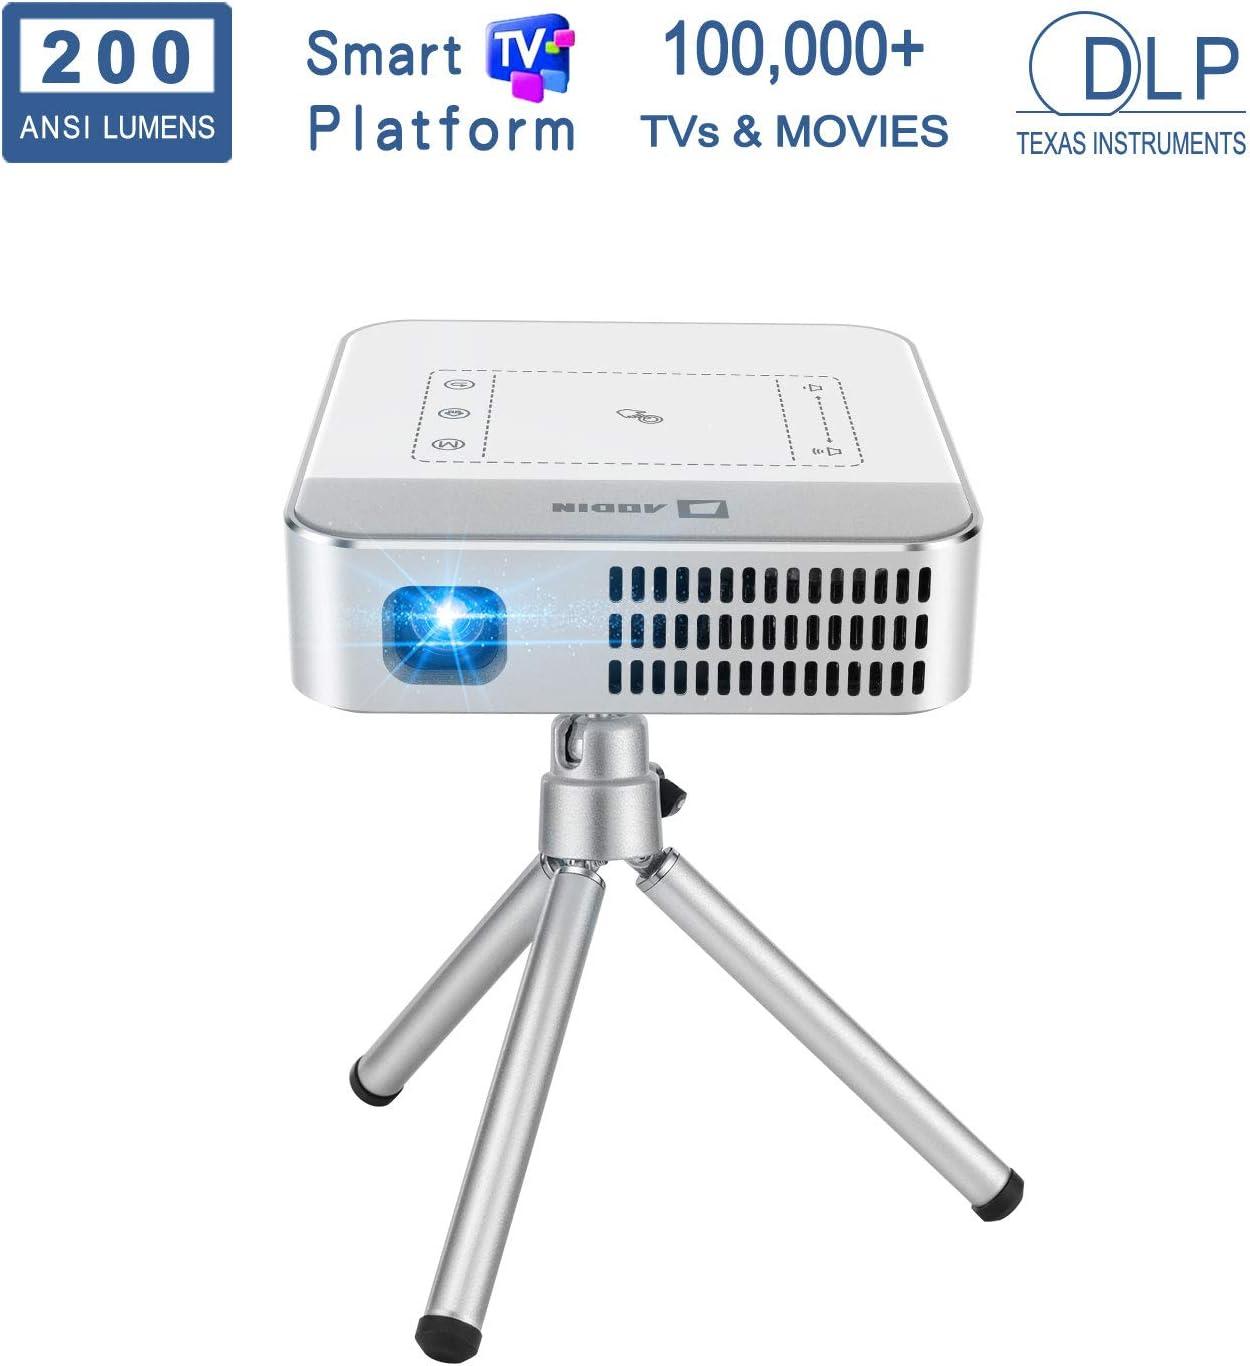 AODIN Wow Proyector de películas portátil WiFi HD 4K, 3500 lúmenes ...